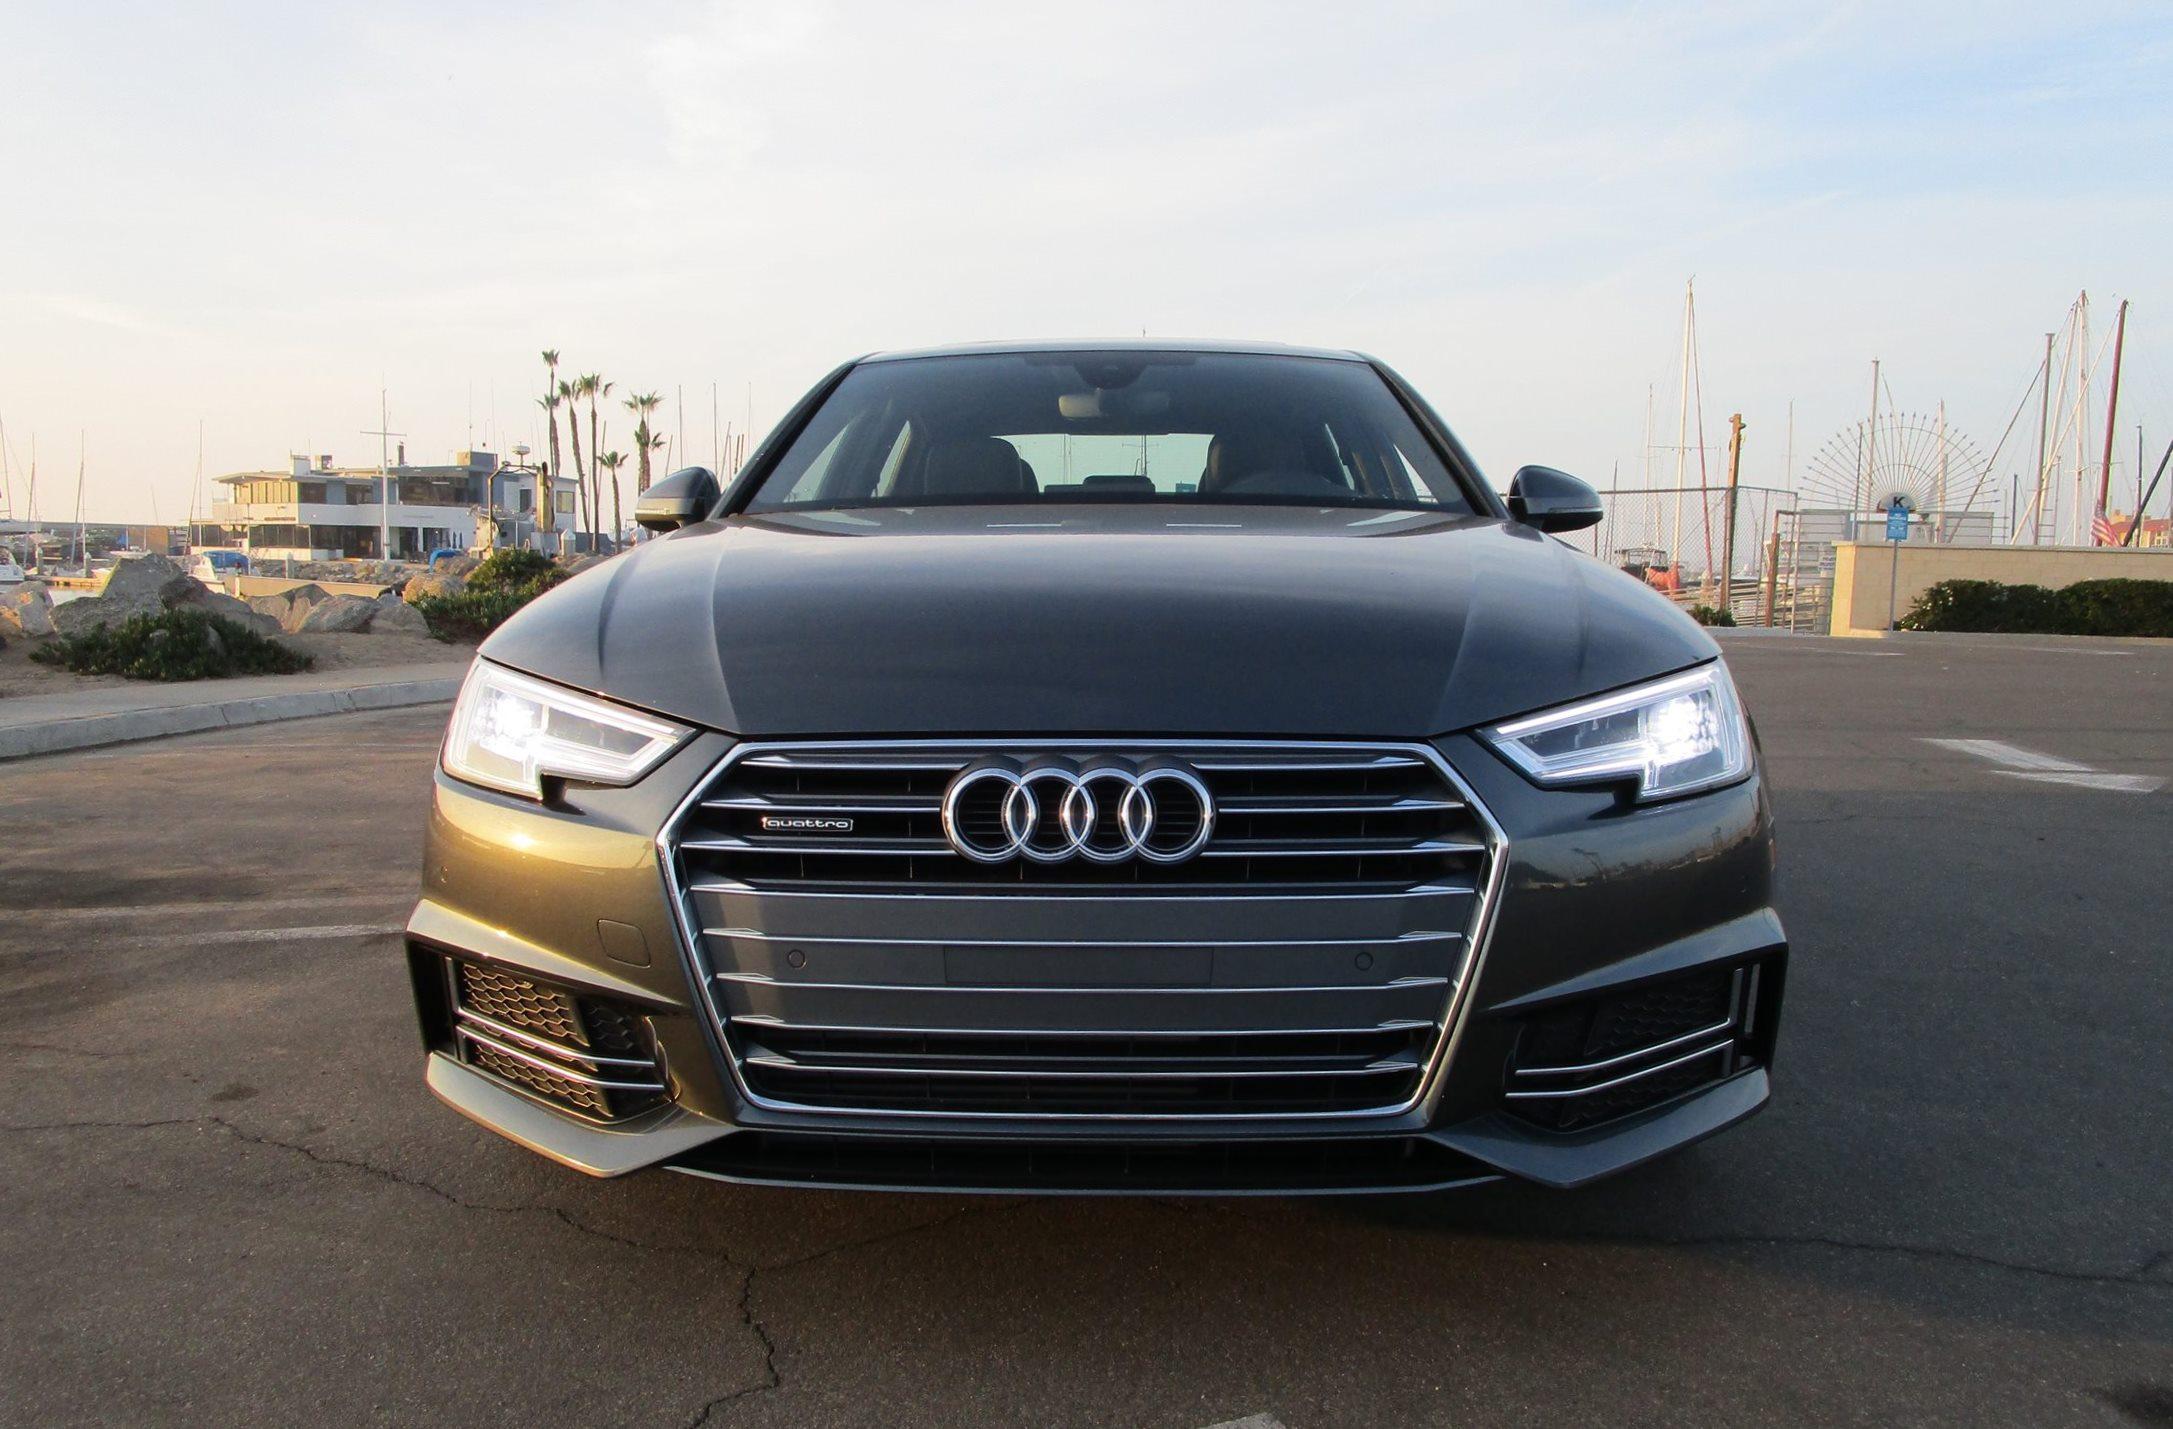 Kekurangan Audi A4 2018 Tangguh